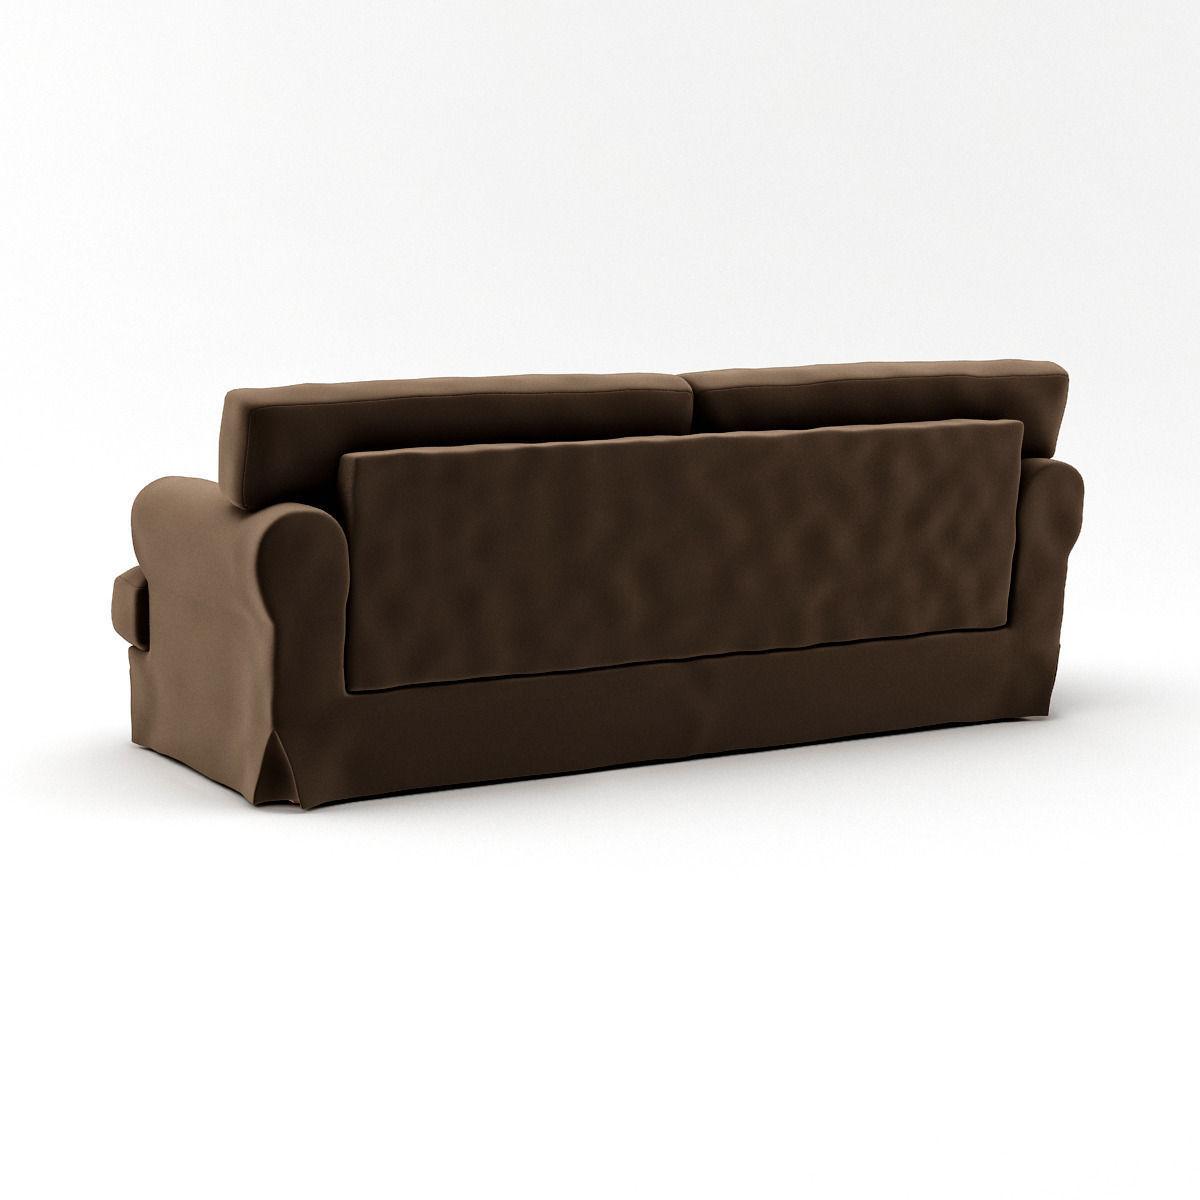 ikea ekeskog sofa for sale ashley furniture 3d model max cgtrader